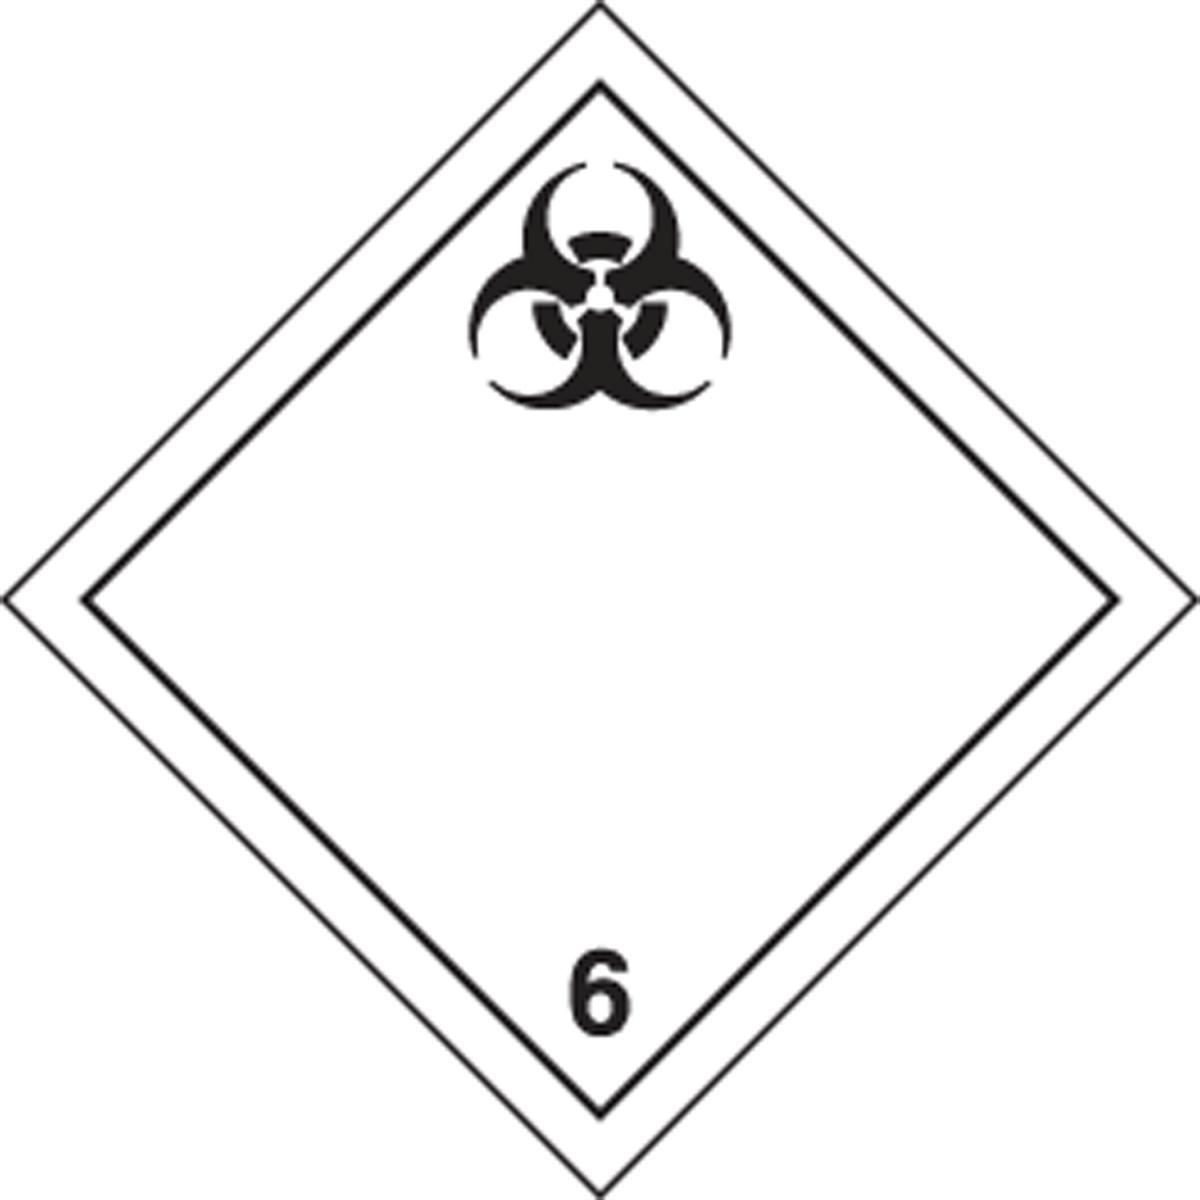 TDG PLACARD - TRANSPORTATION OF DANGEROUS GOODS